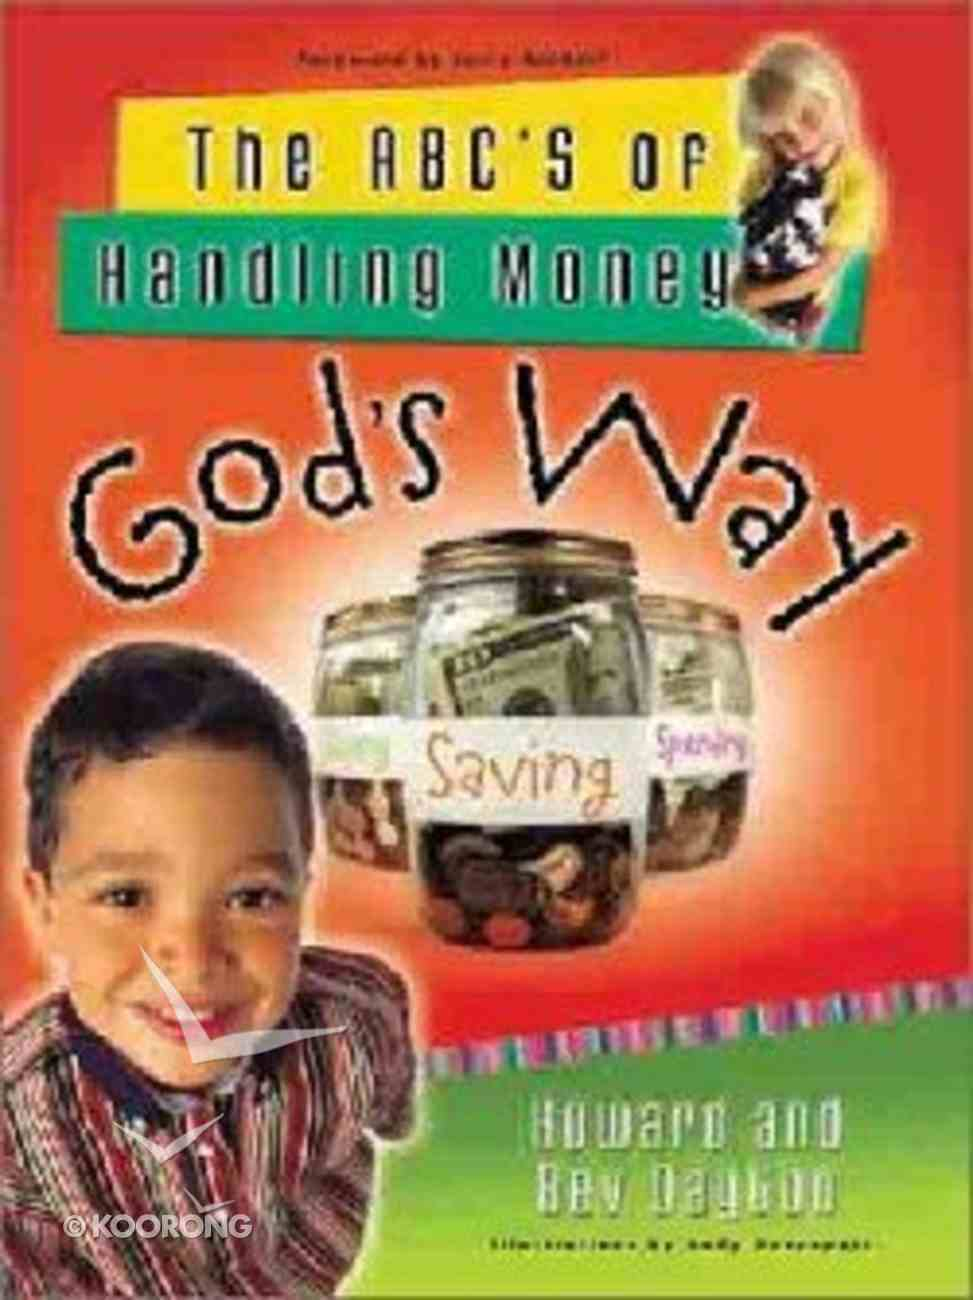 The Abc's of Handling Money God's Way Paperback